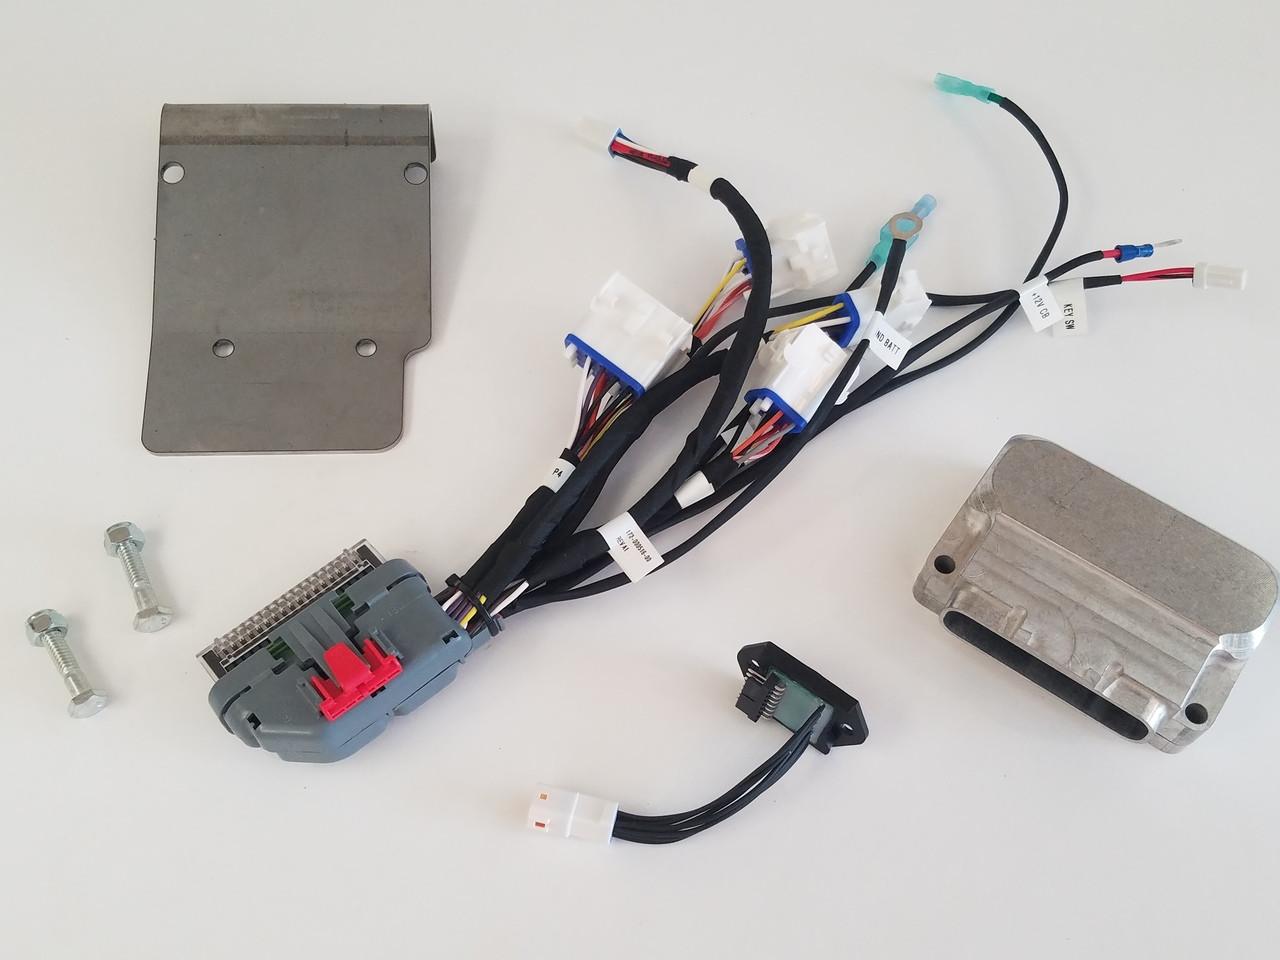 2003 ehc replacement system u2013 bulldog chopper boxer big dog big dog ignition [ 1280 x 960 Pixel ]